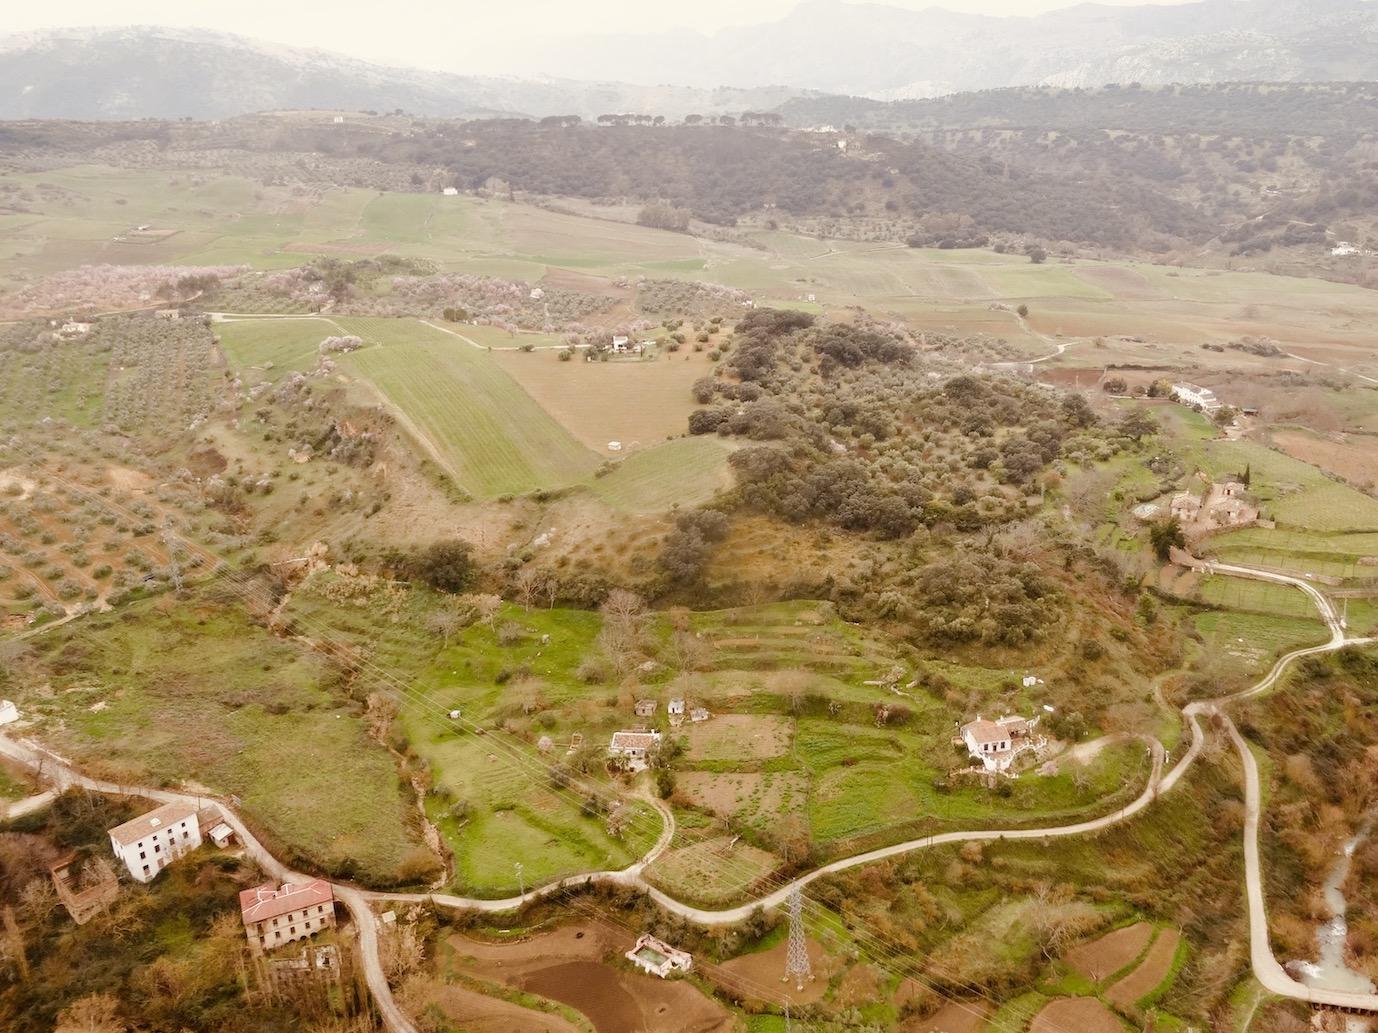 Ronda countryside in Spain.